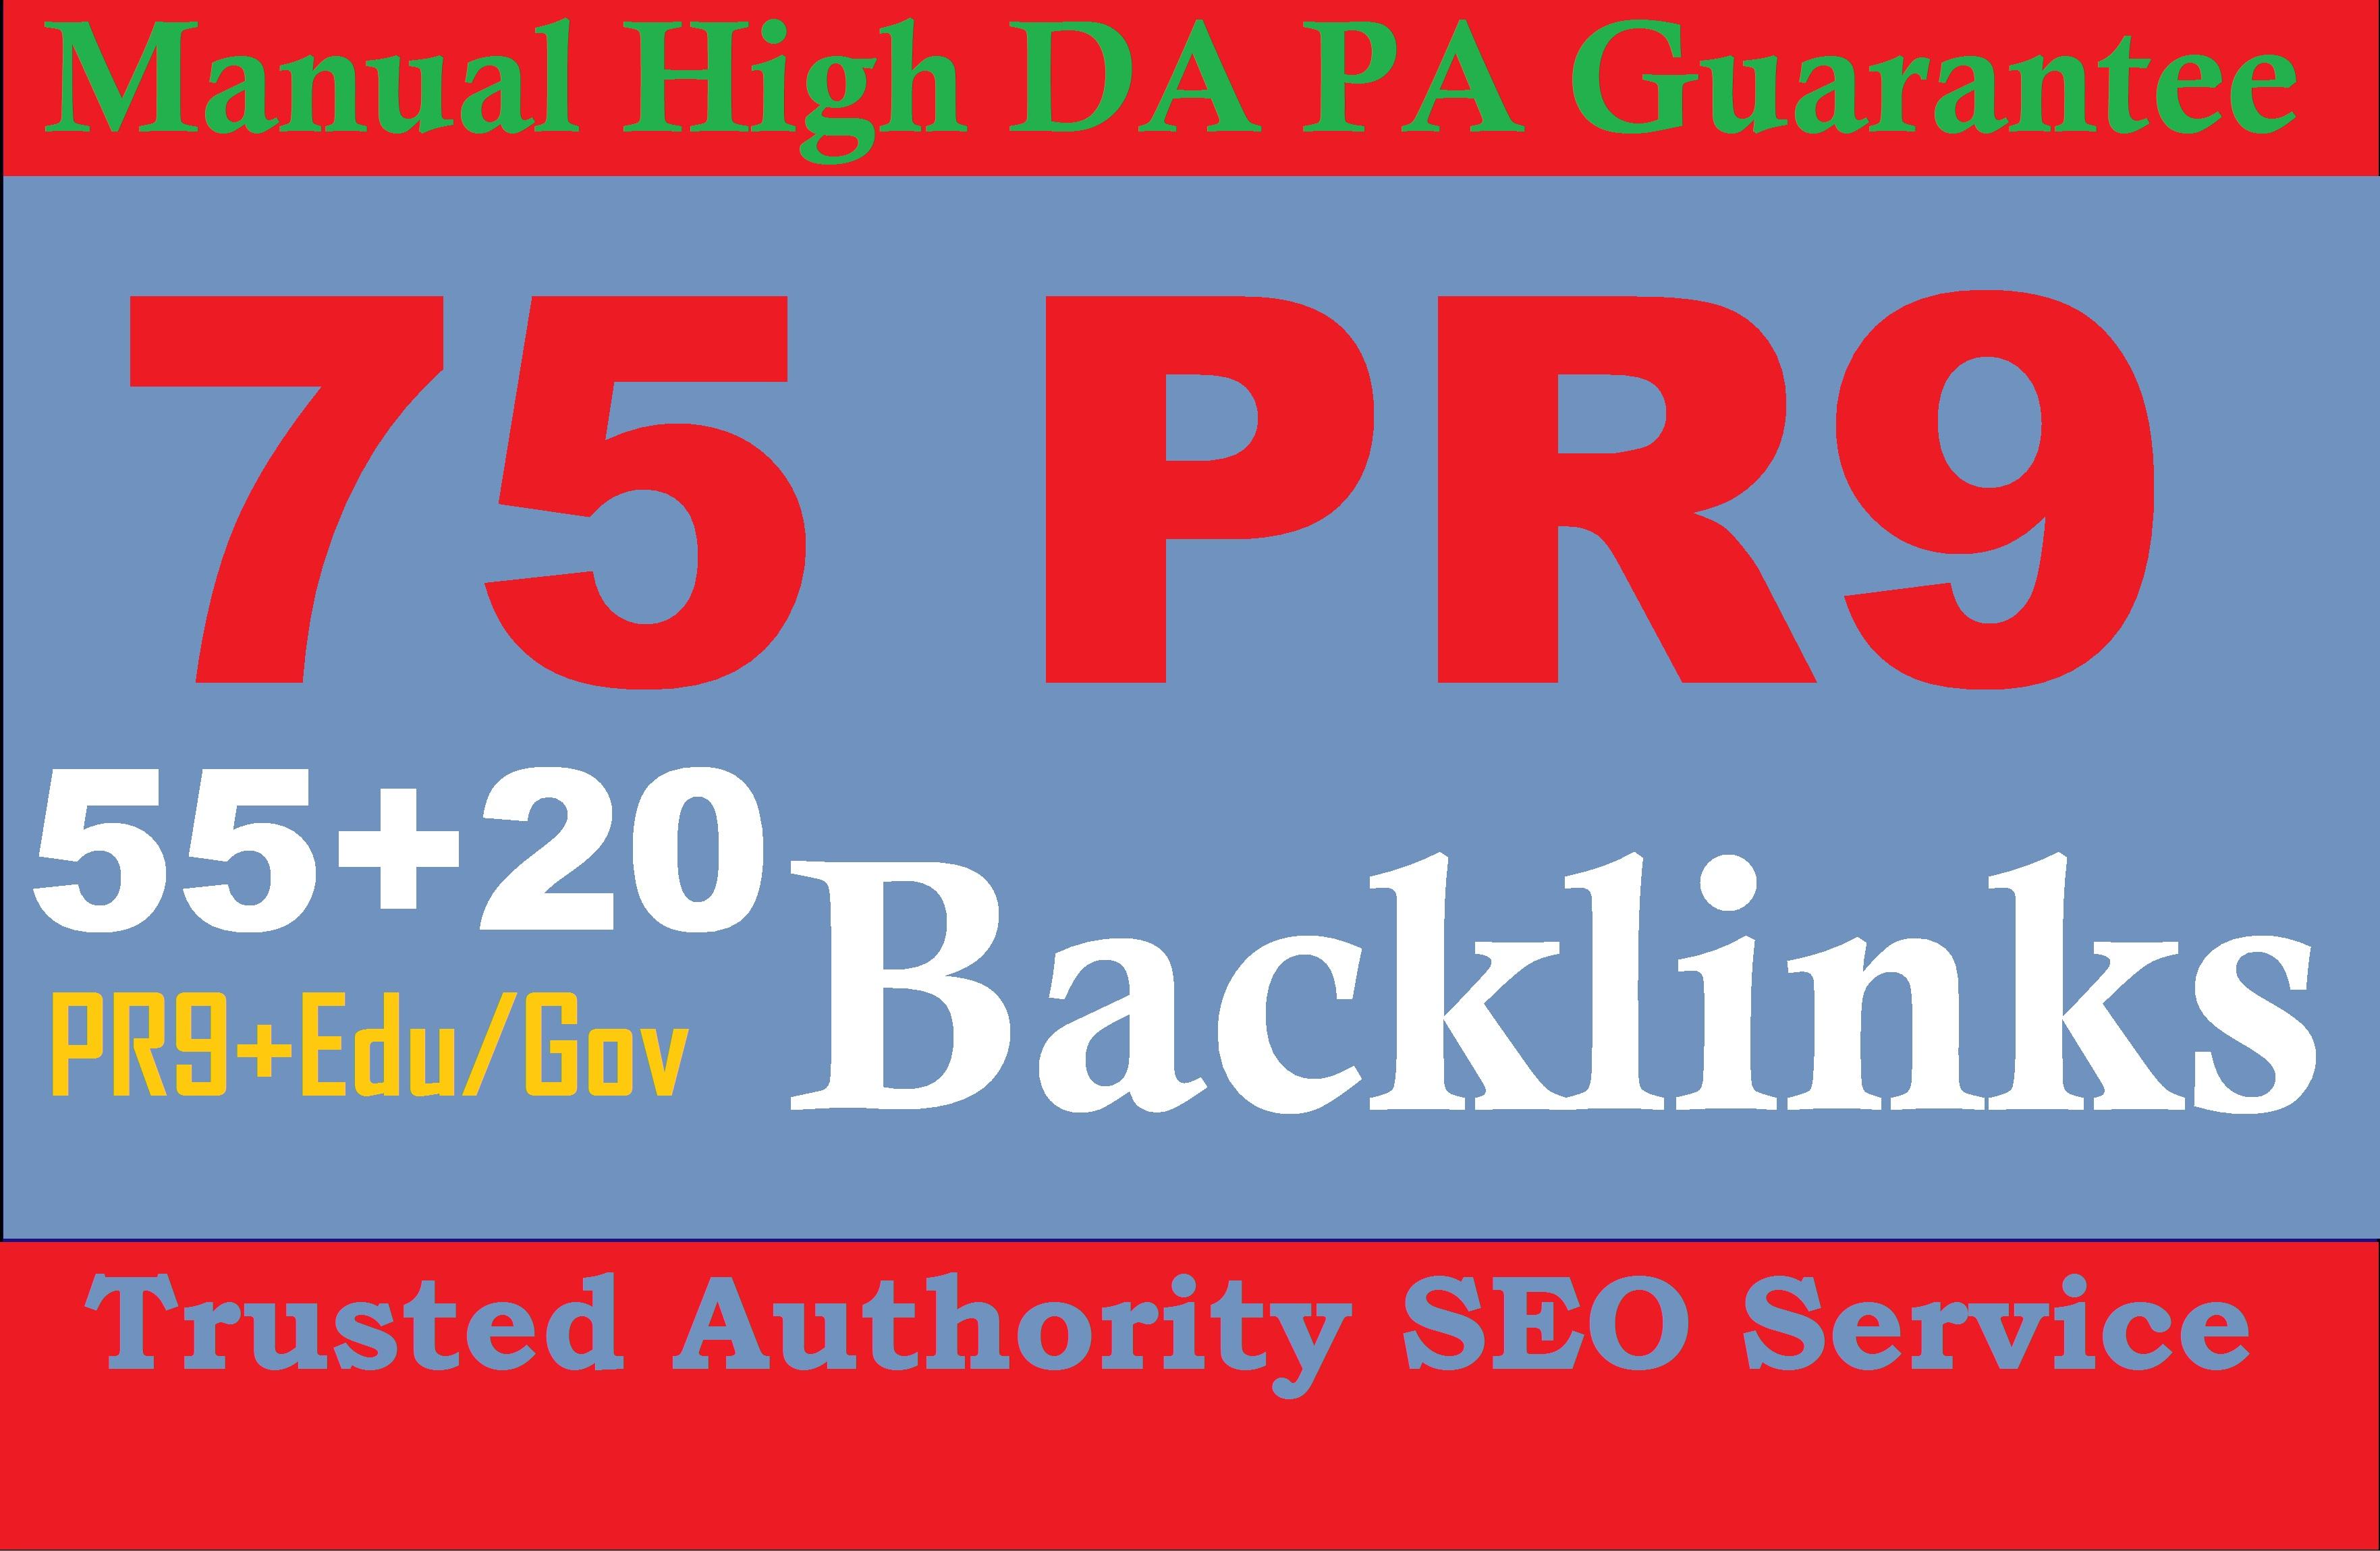 Exclusively 75 Backlinks 55 PR9 +20 EDU/GOV 80+DA Permanent SEO Links Improve Google Ranking